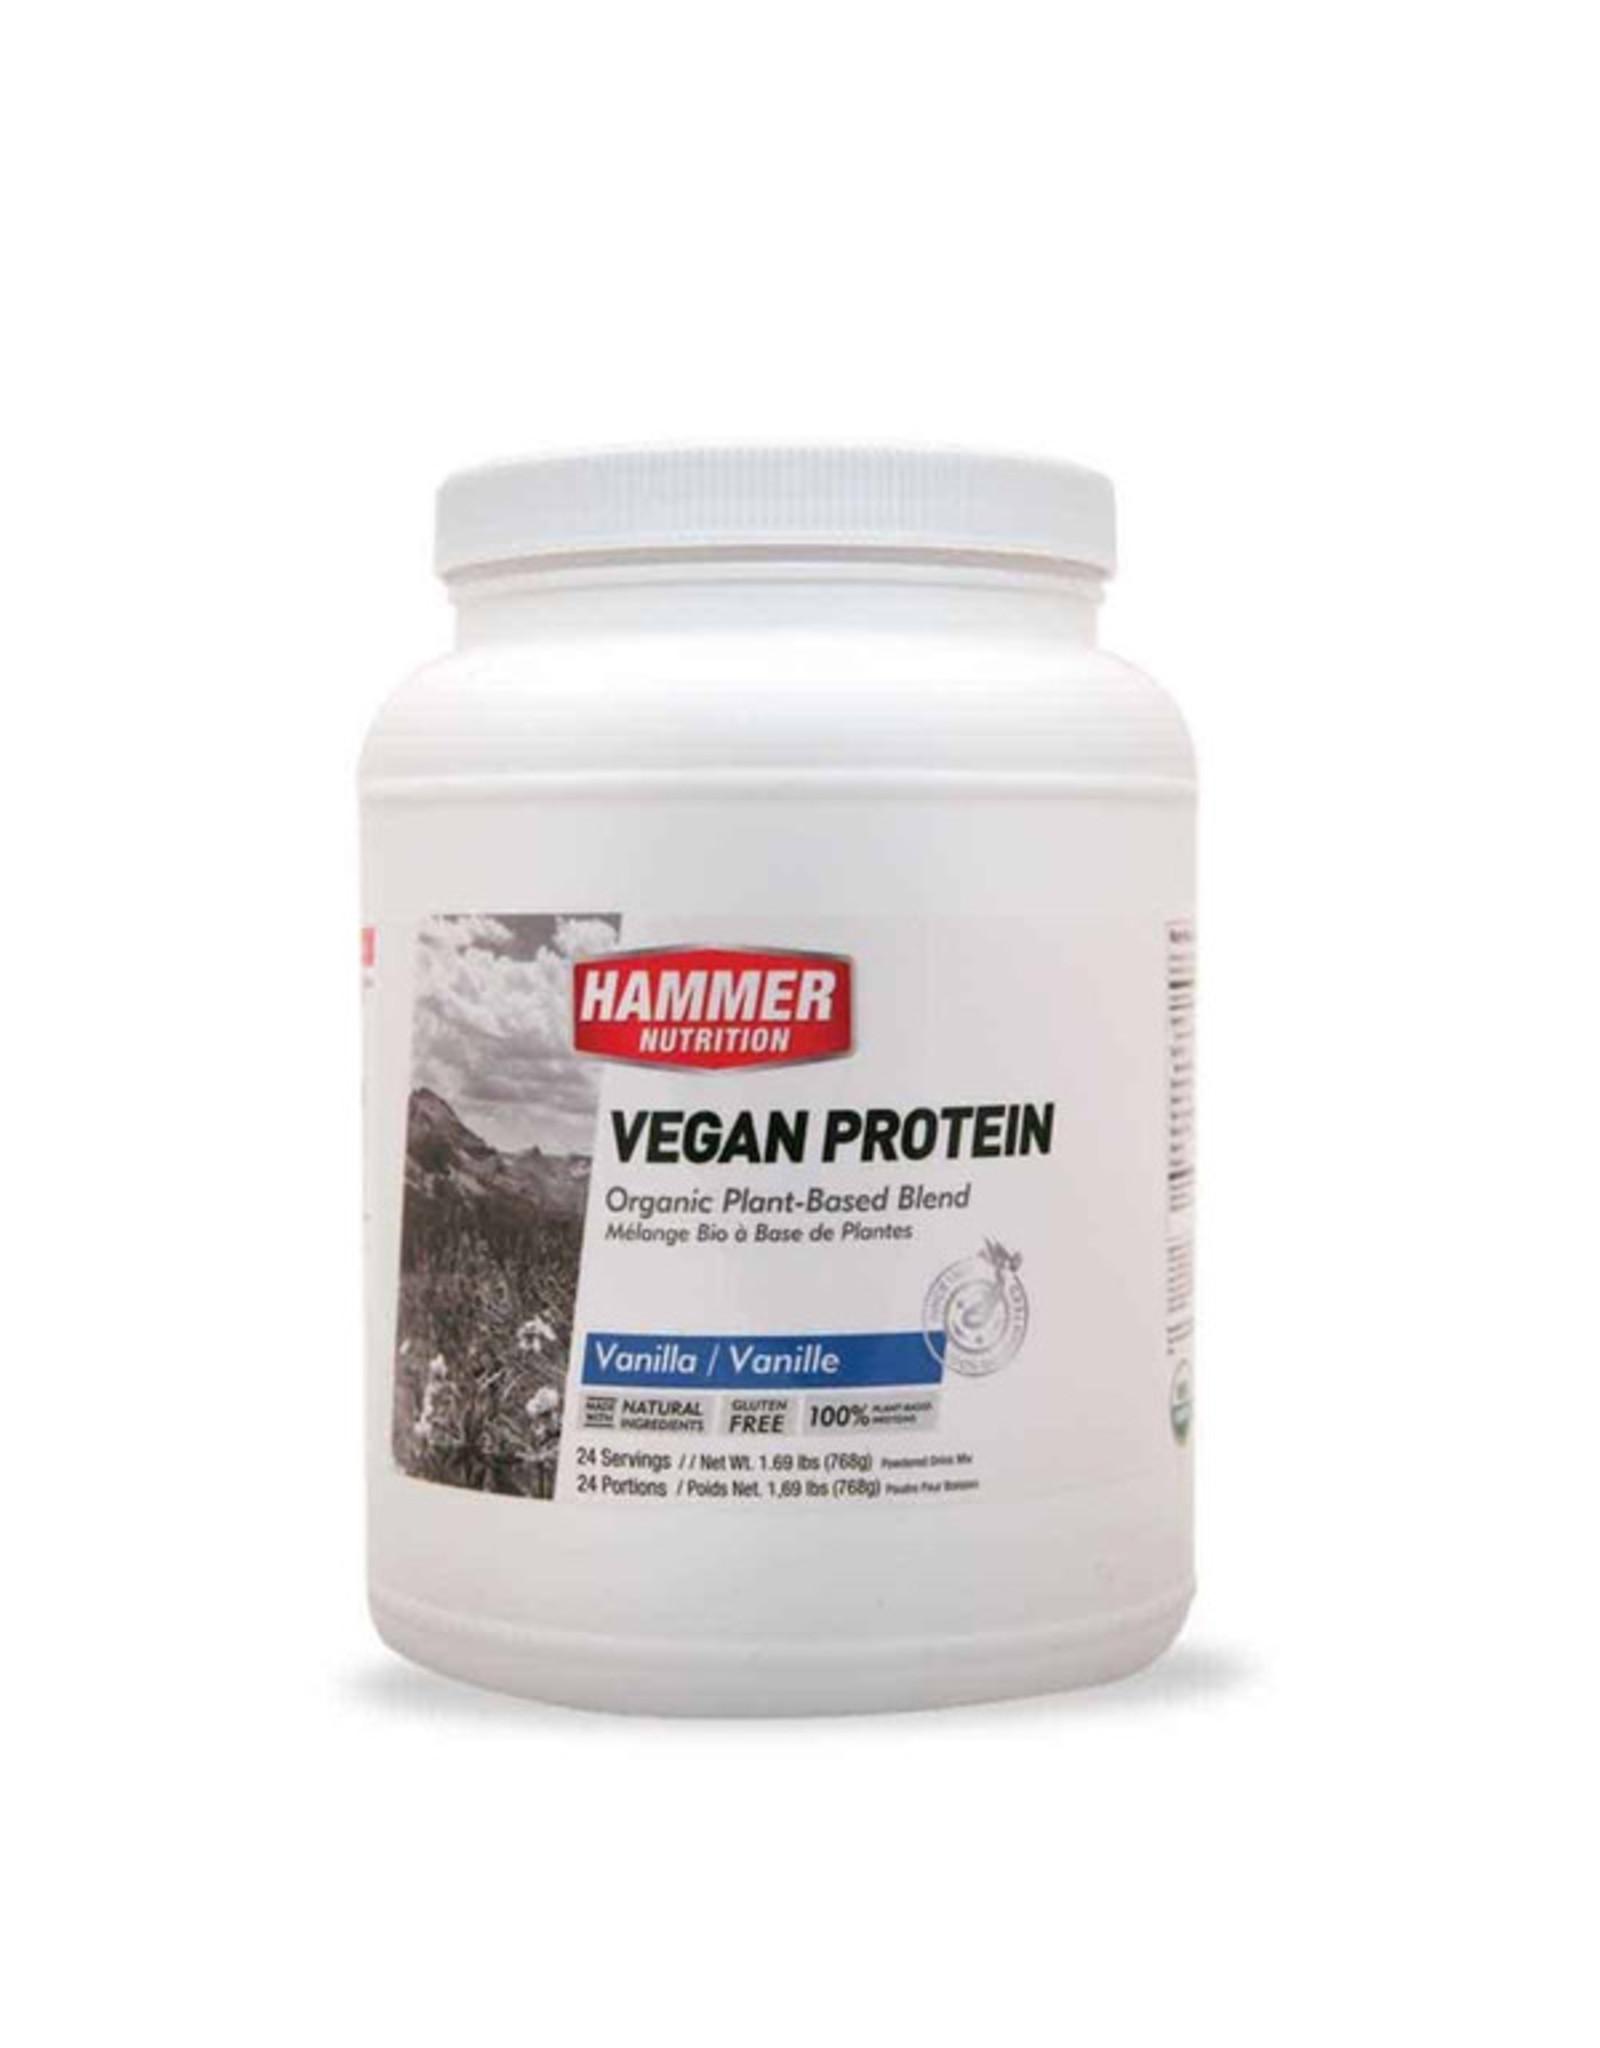 Hammer Nutrition Hammer Nutrition Vegan Protein Powder